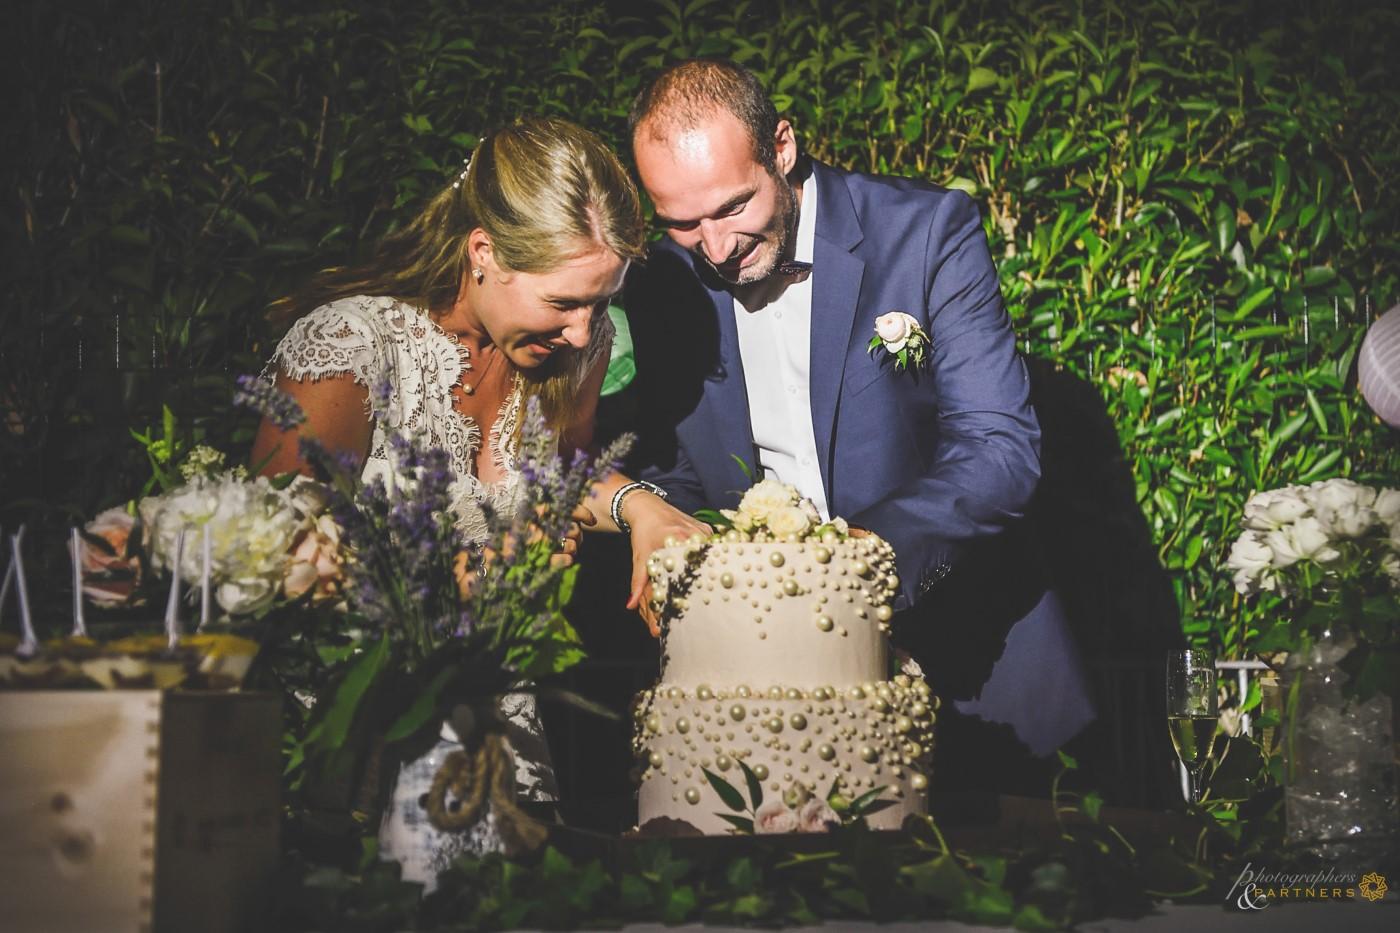 Cutting the wedding cake 🍰